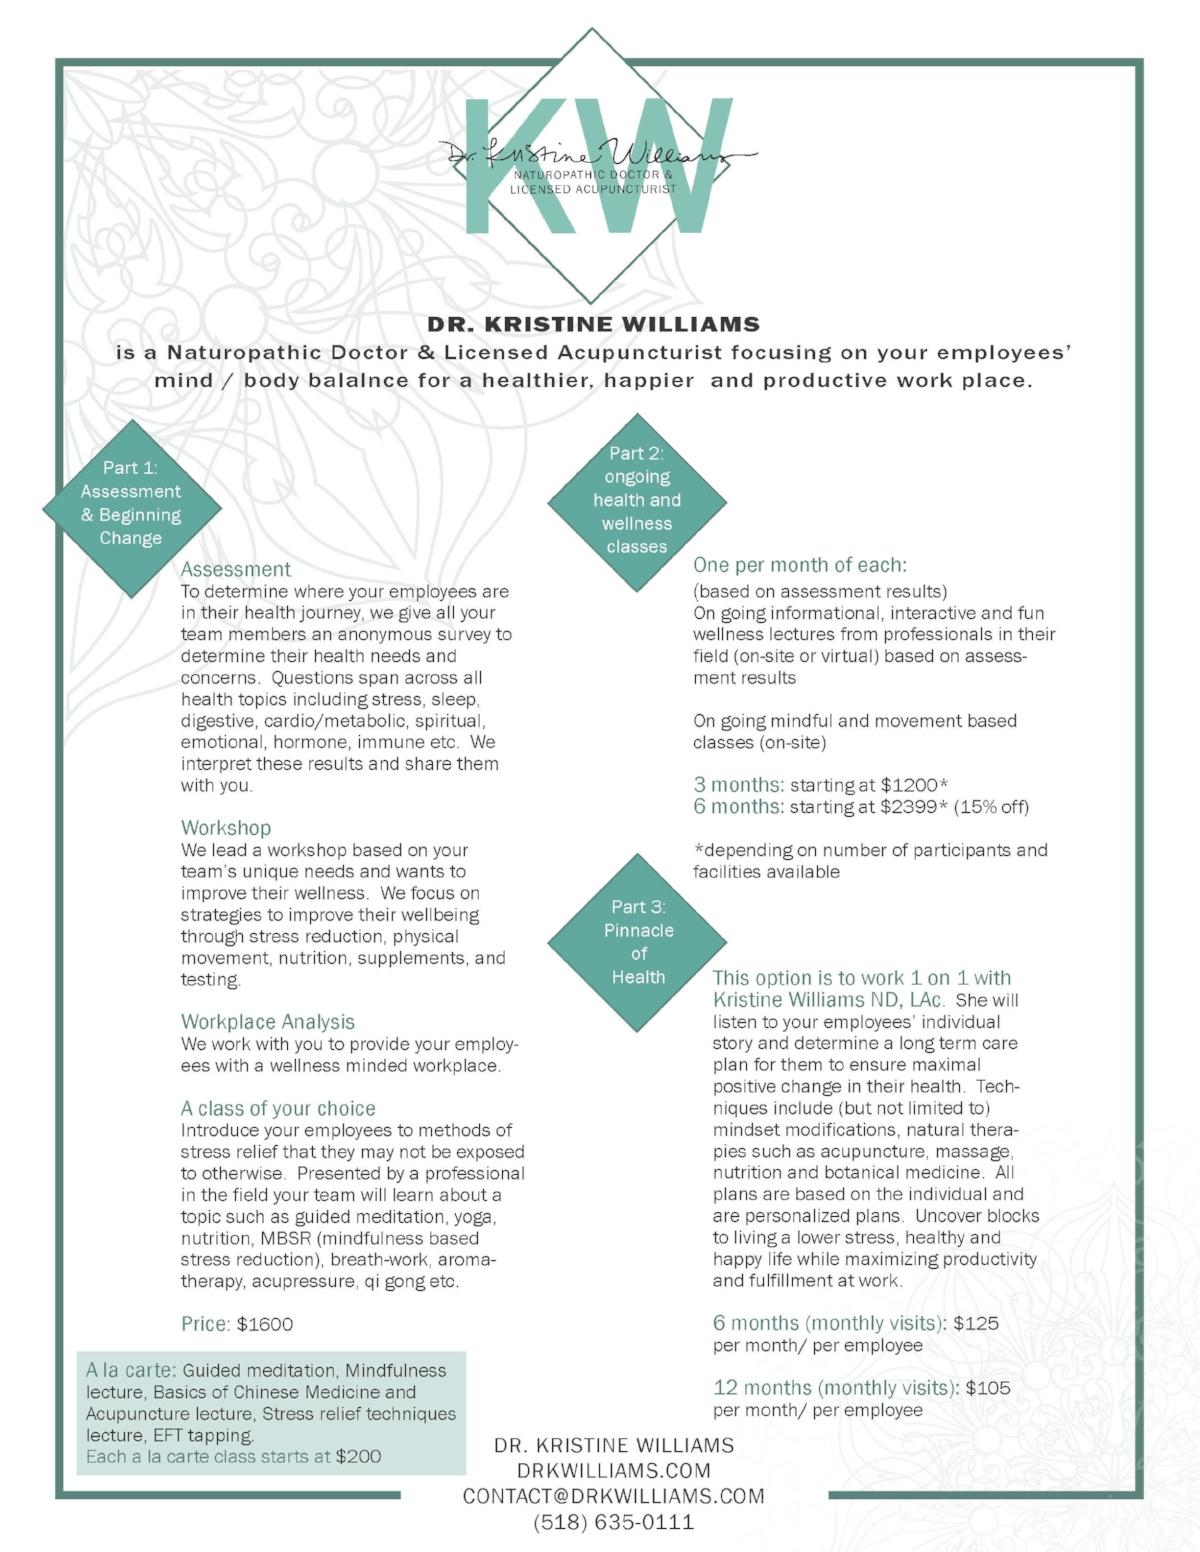 DKW Corporate Wellness Services.jpg